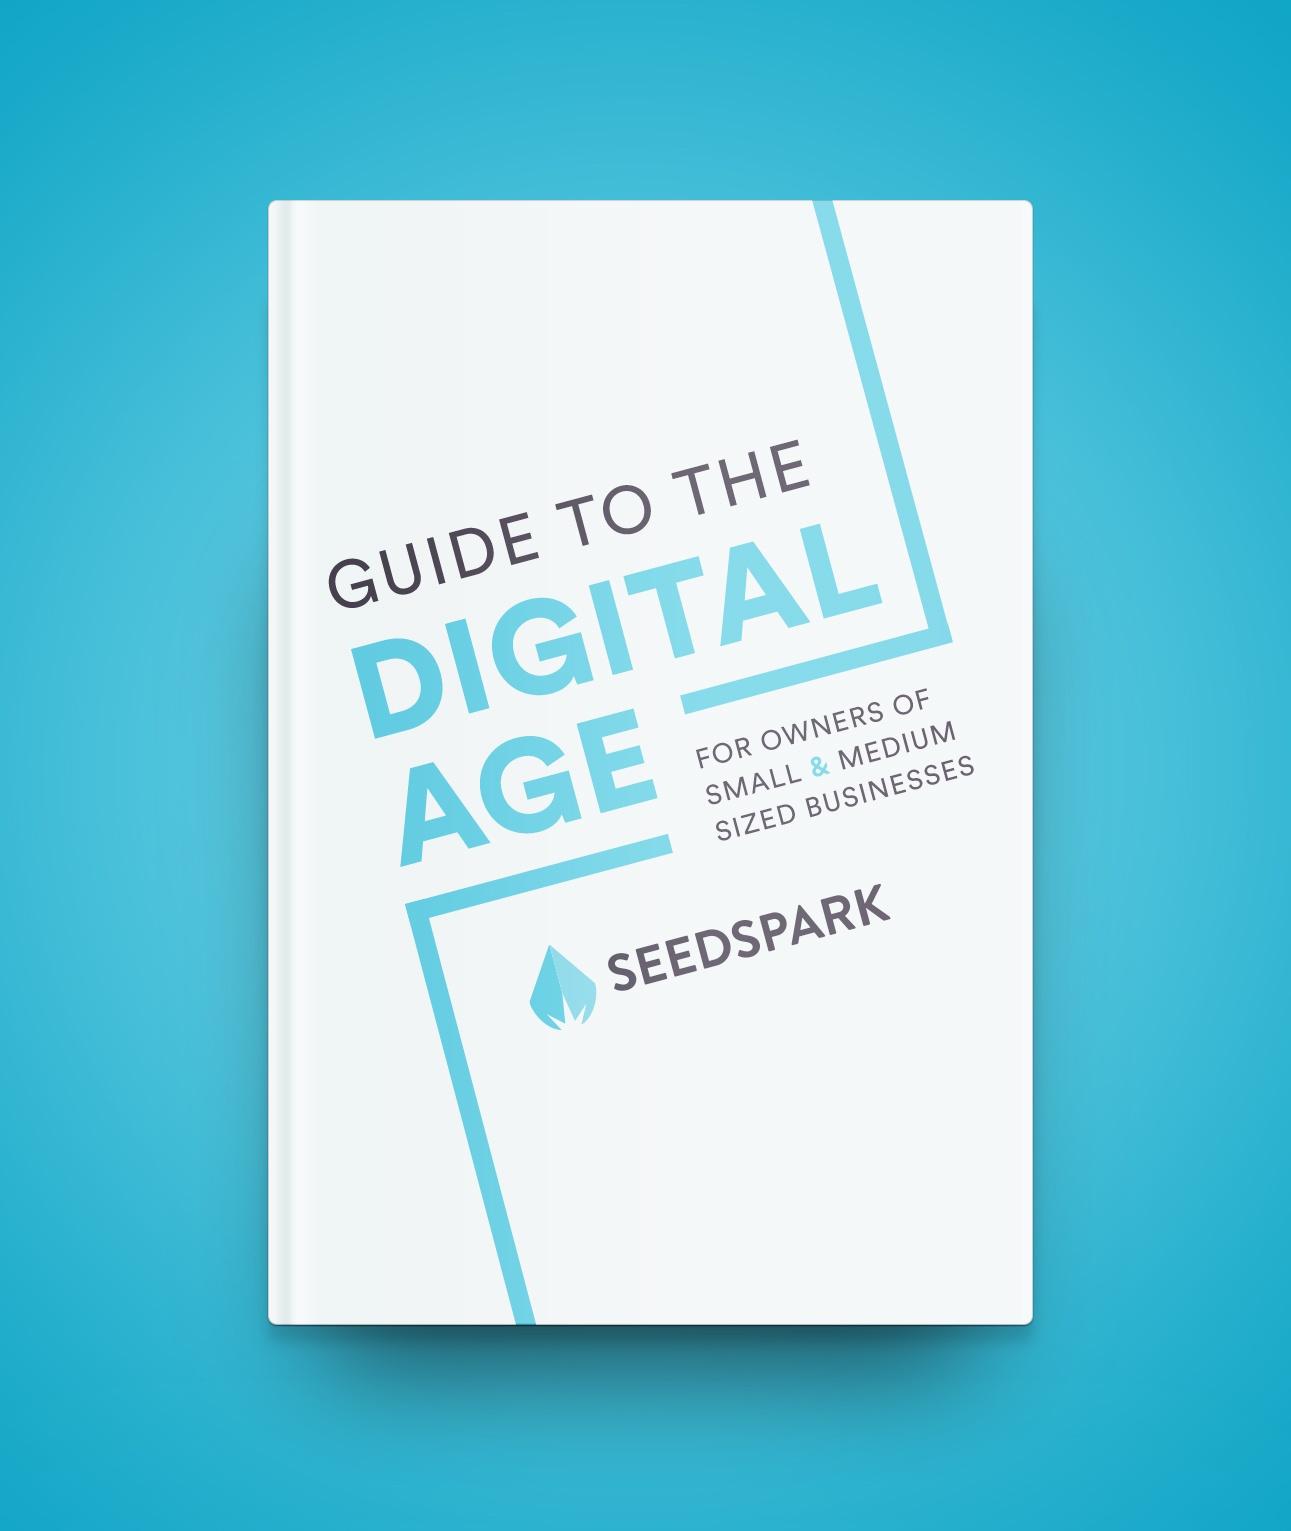 SeedSpark-book-mockup.jpg